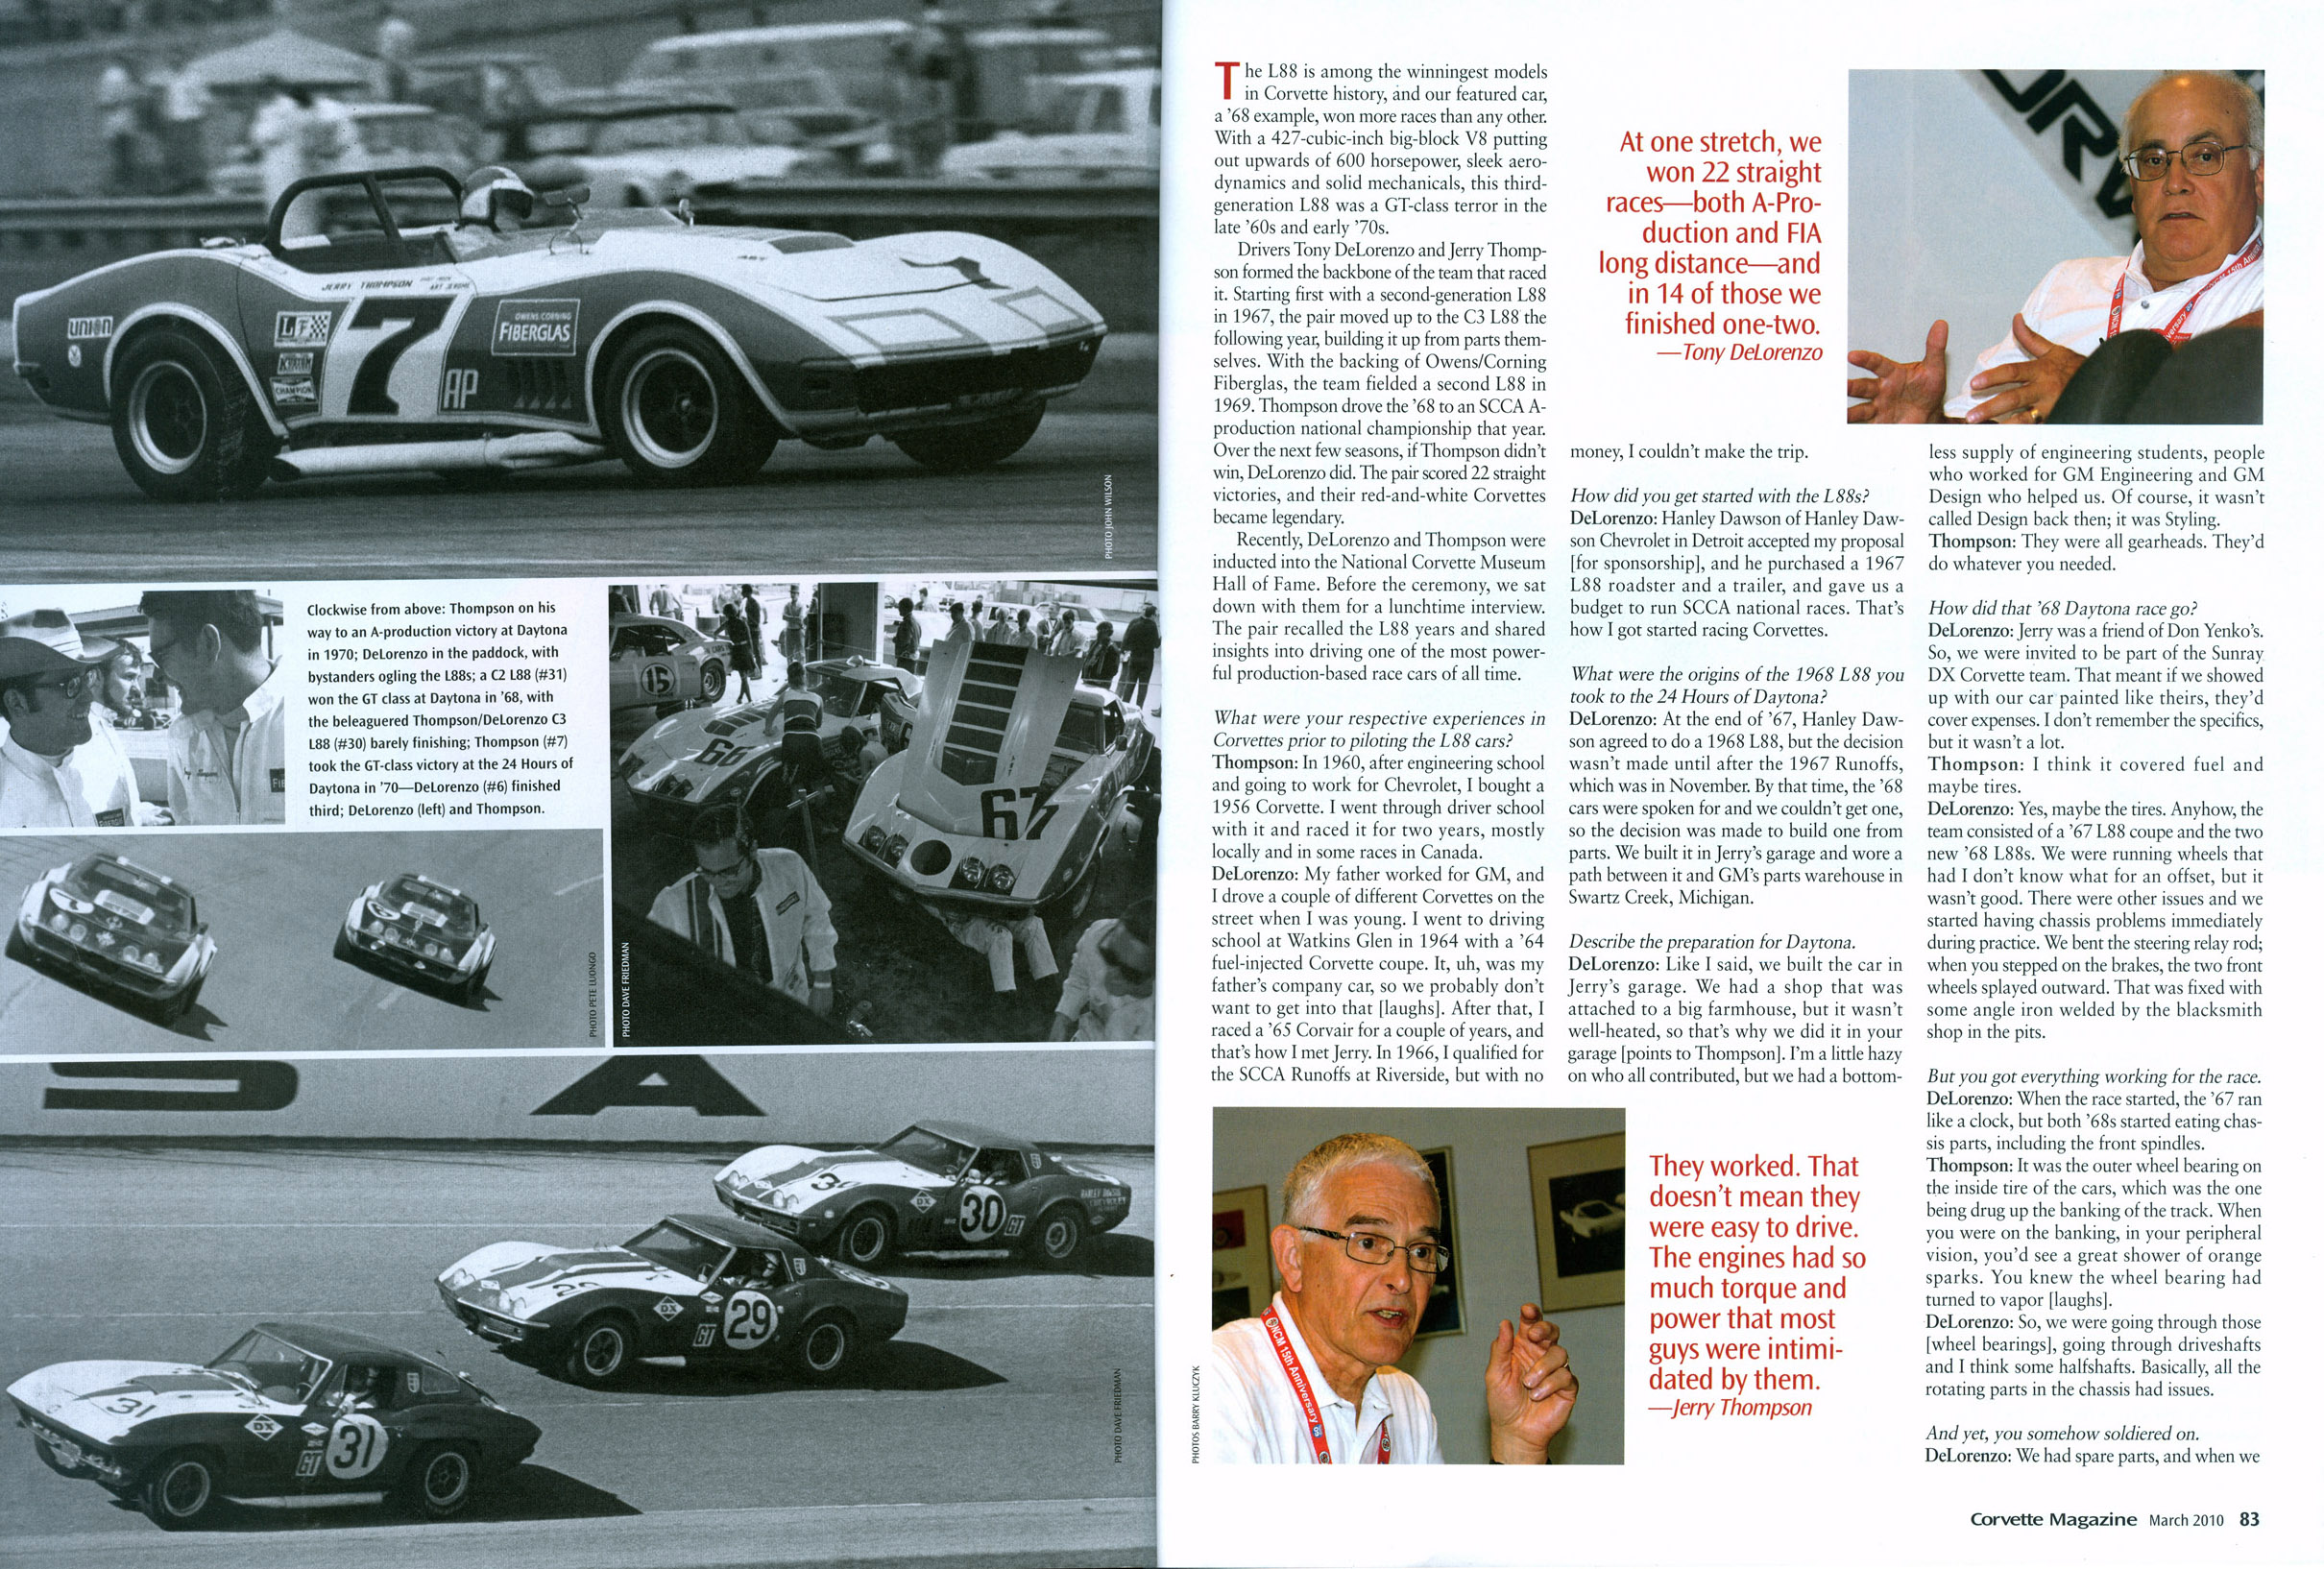 CorvetteMagazineMarch2010_3